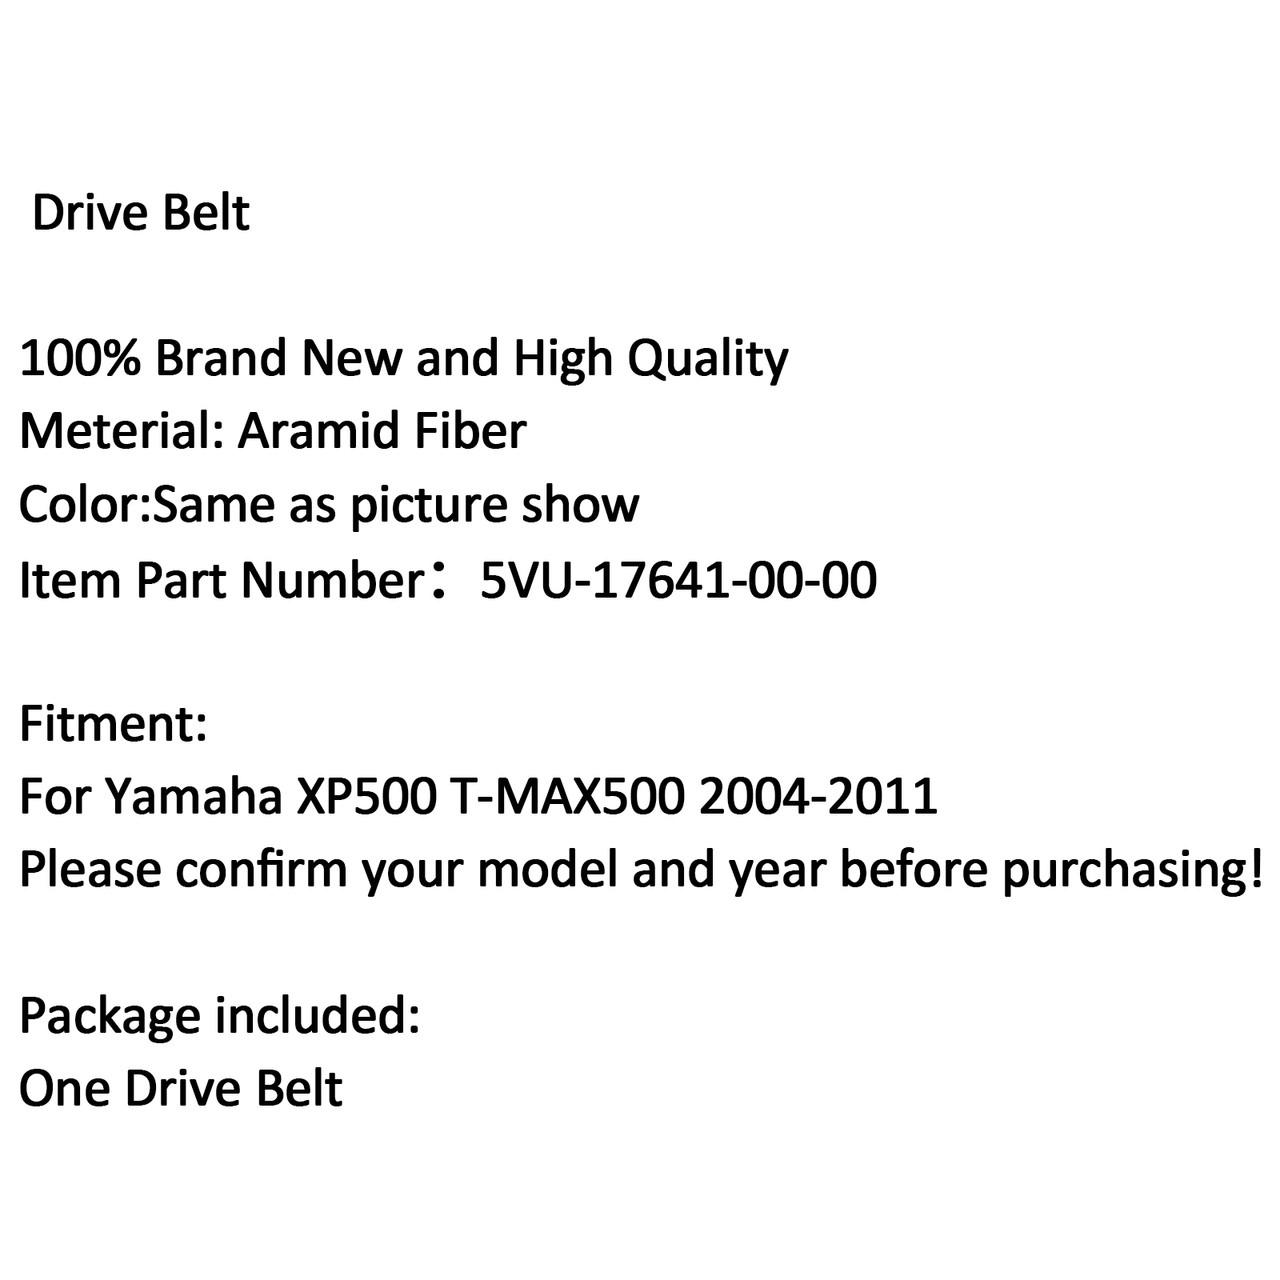 Scooter Drive Belt For Yamaha XP500 T-MAX 500 2004-2011 5VU-17641-00-00 (M510-A008-Black)